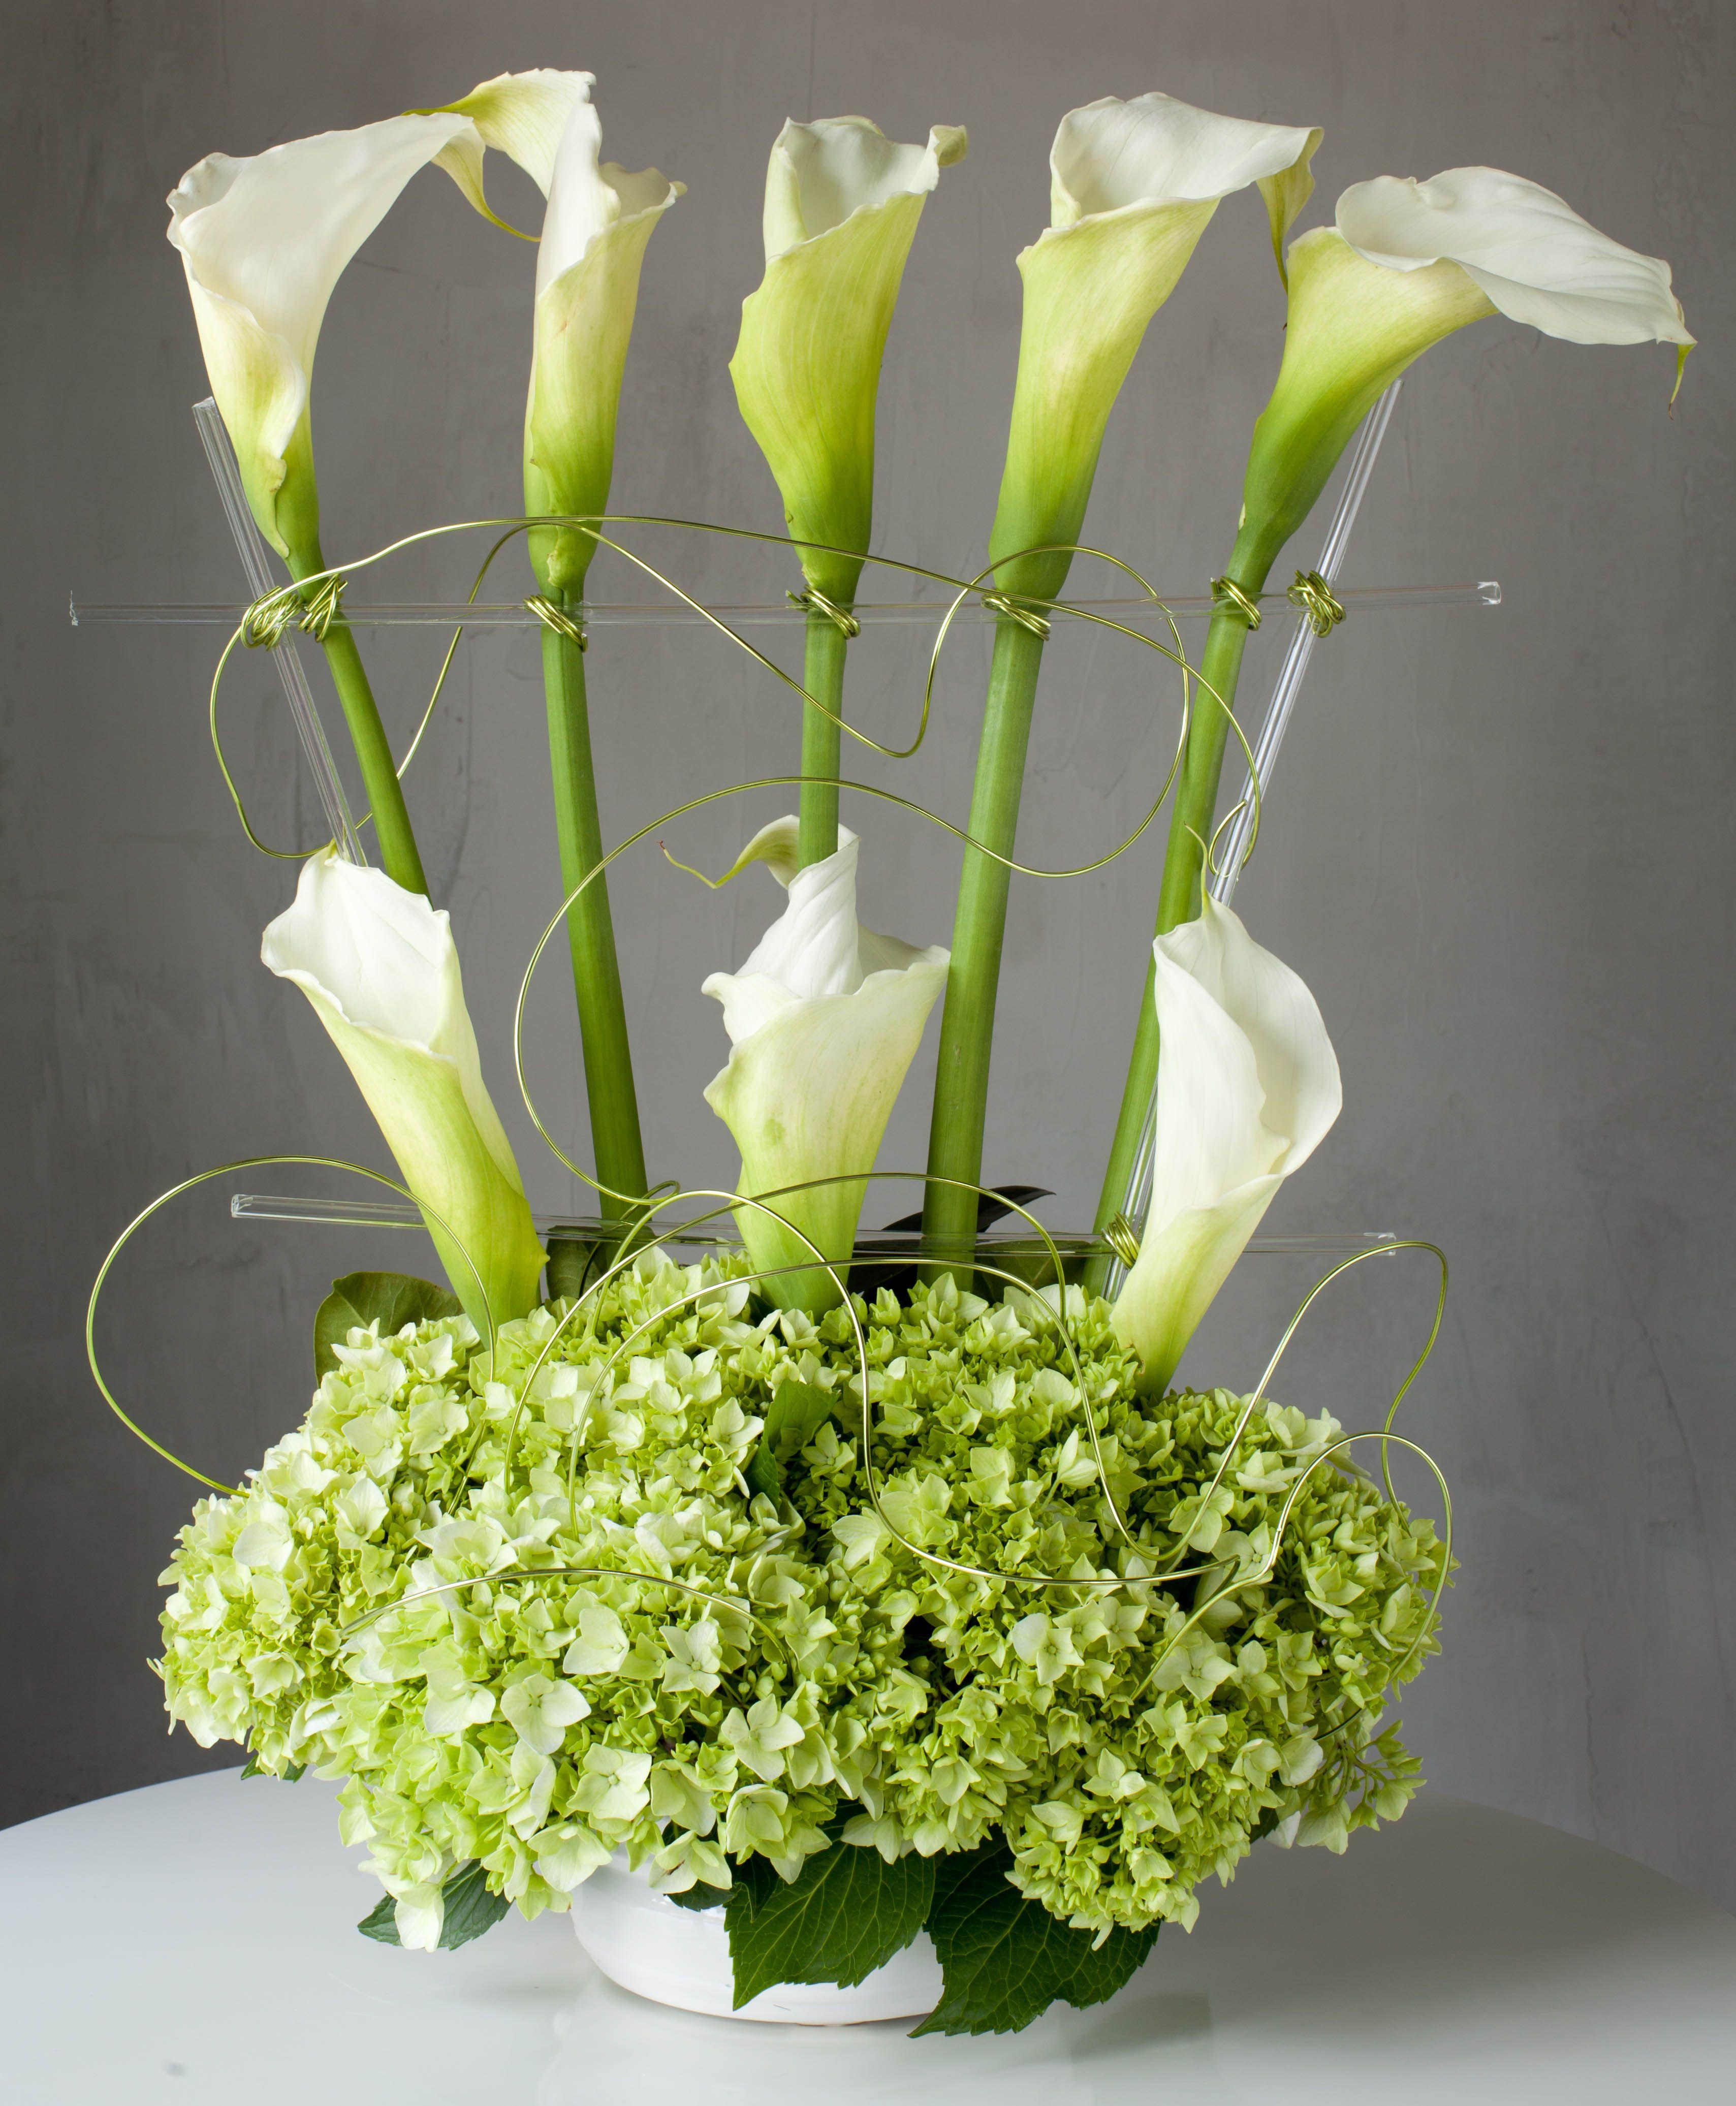 Flowers By Nino Houstons A List Florist #Flowersbynino #Houstonflorist #Houston